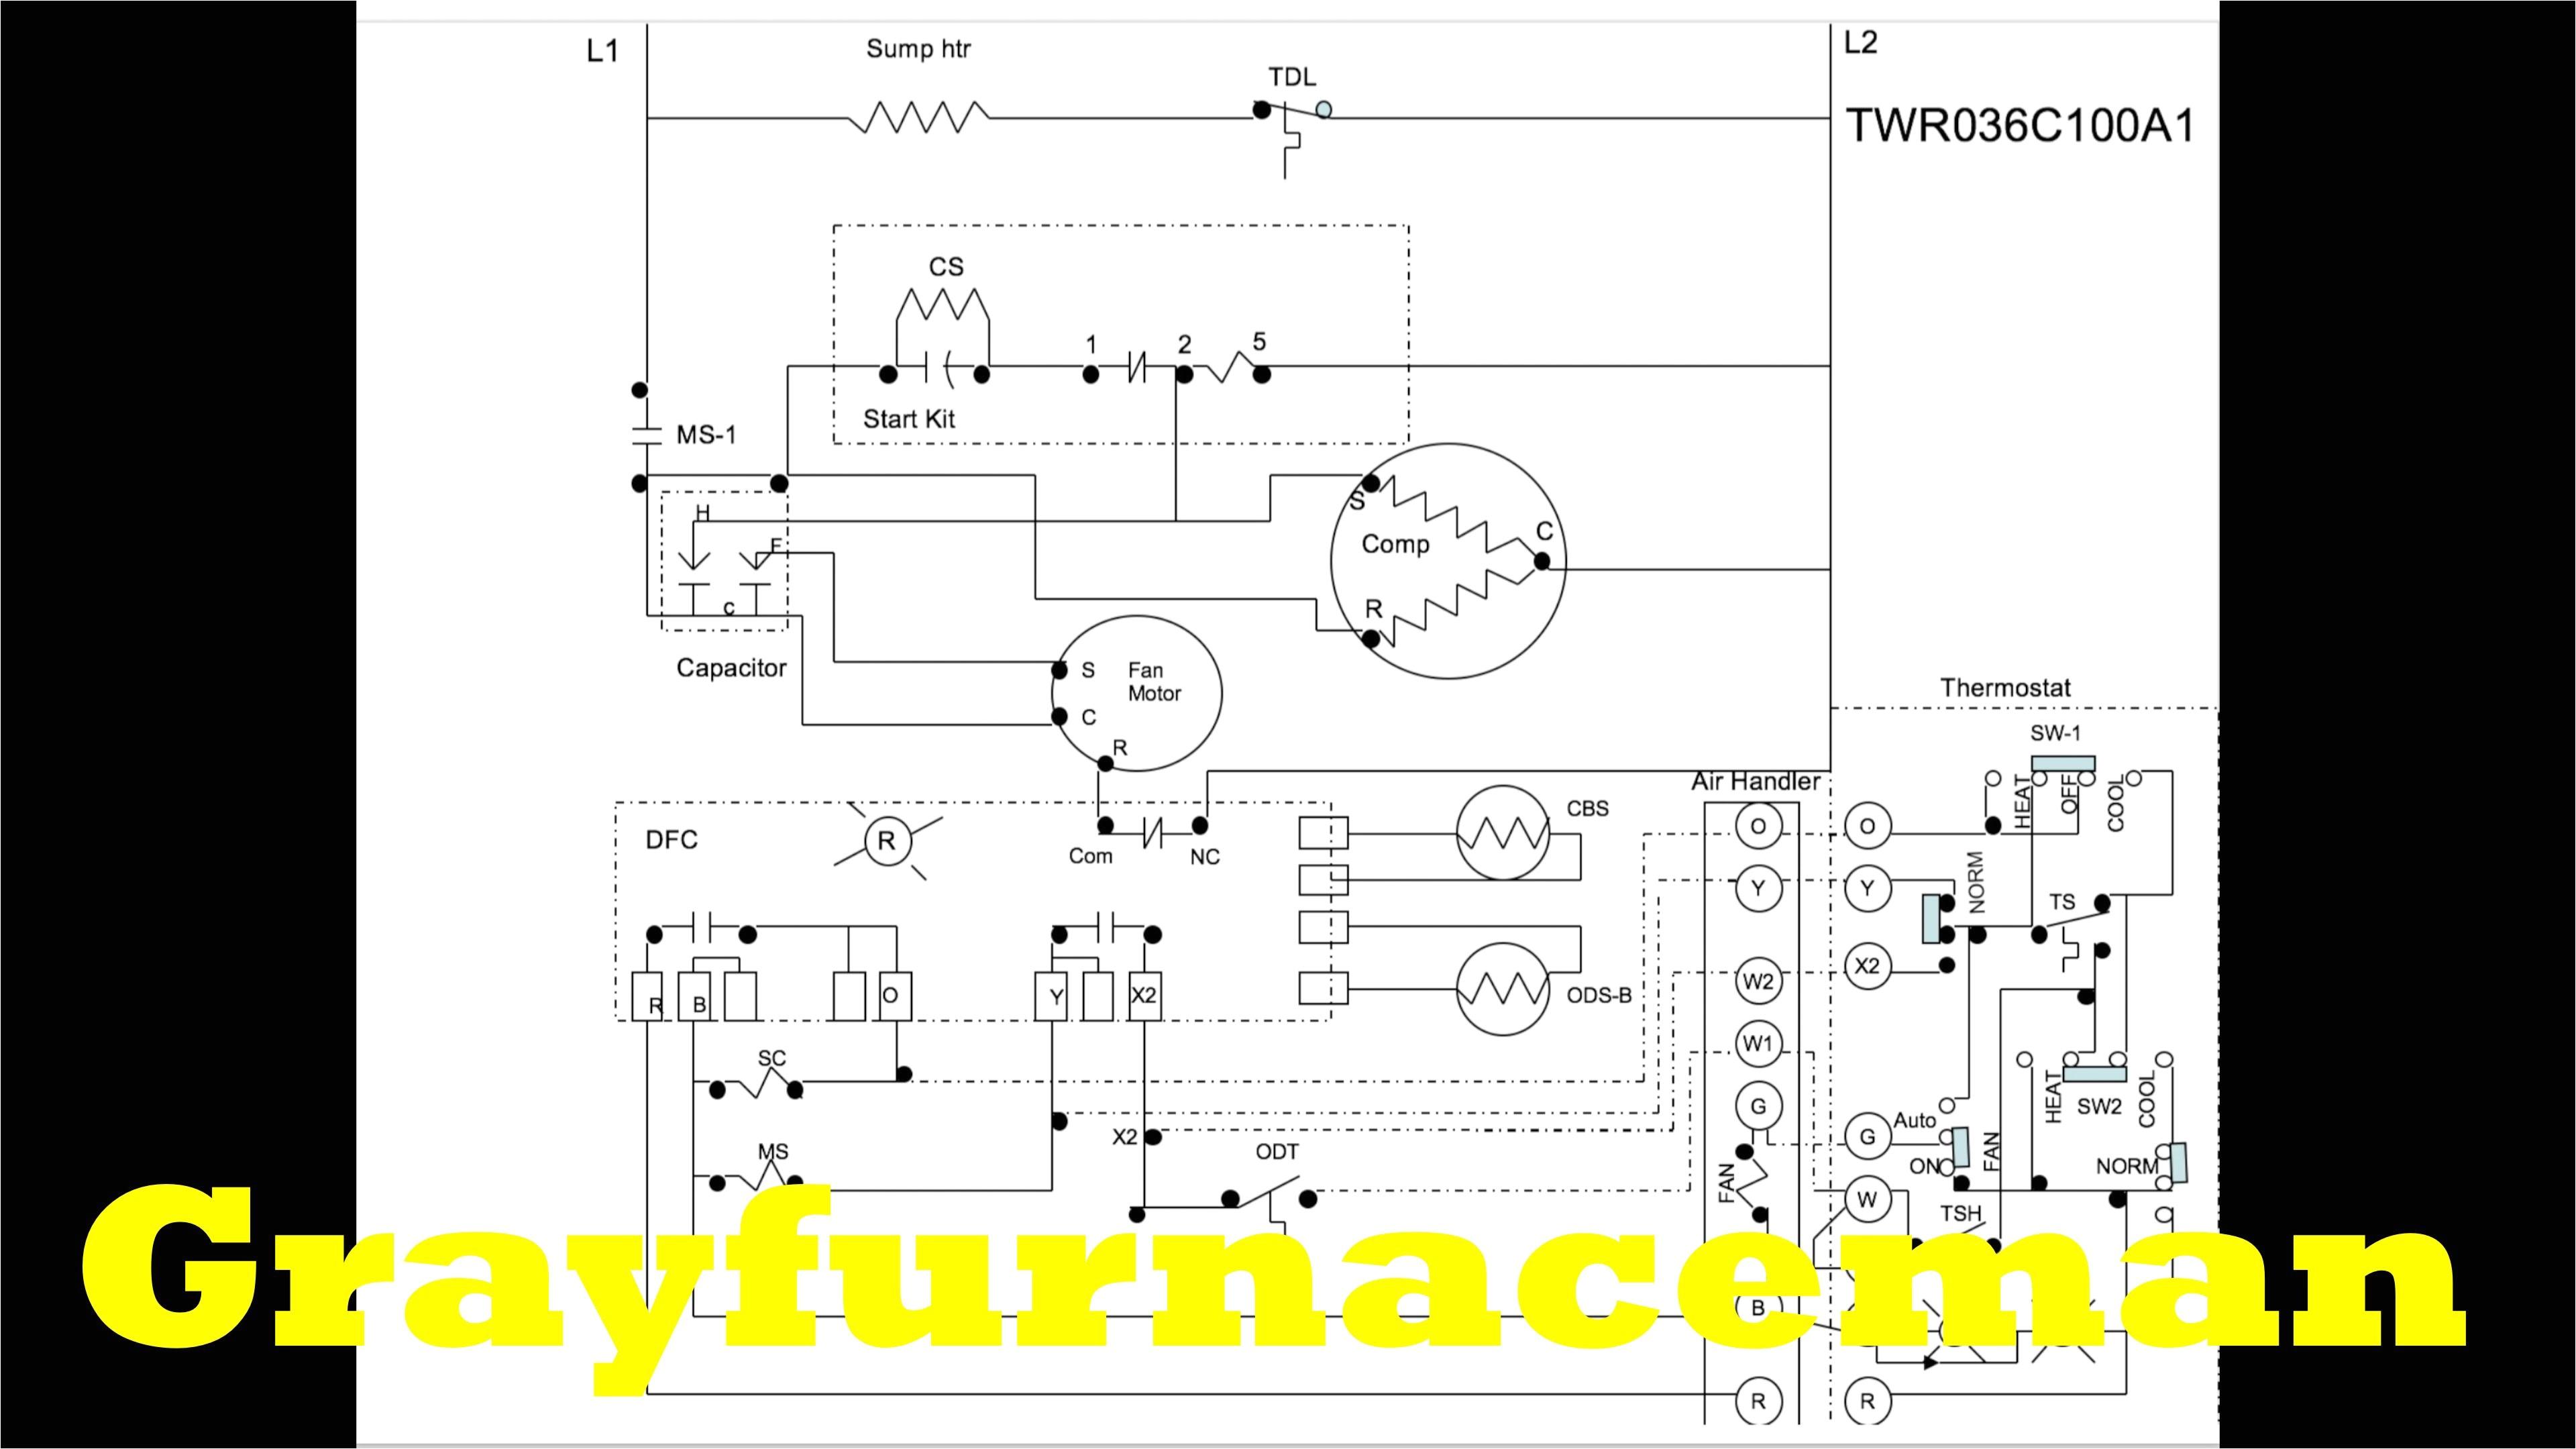 heat pump wiring explained book diagram schema carrier water source heat pump wiring diagram carrier wiring diagram heat pump